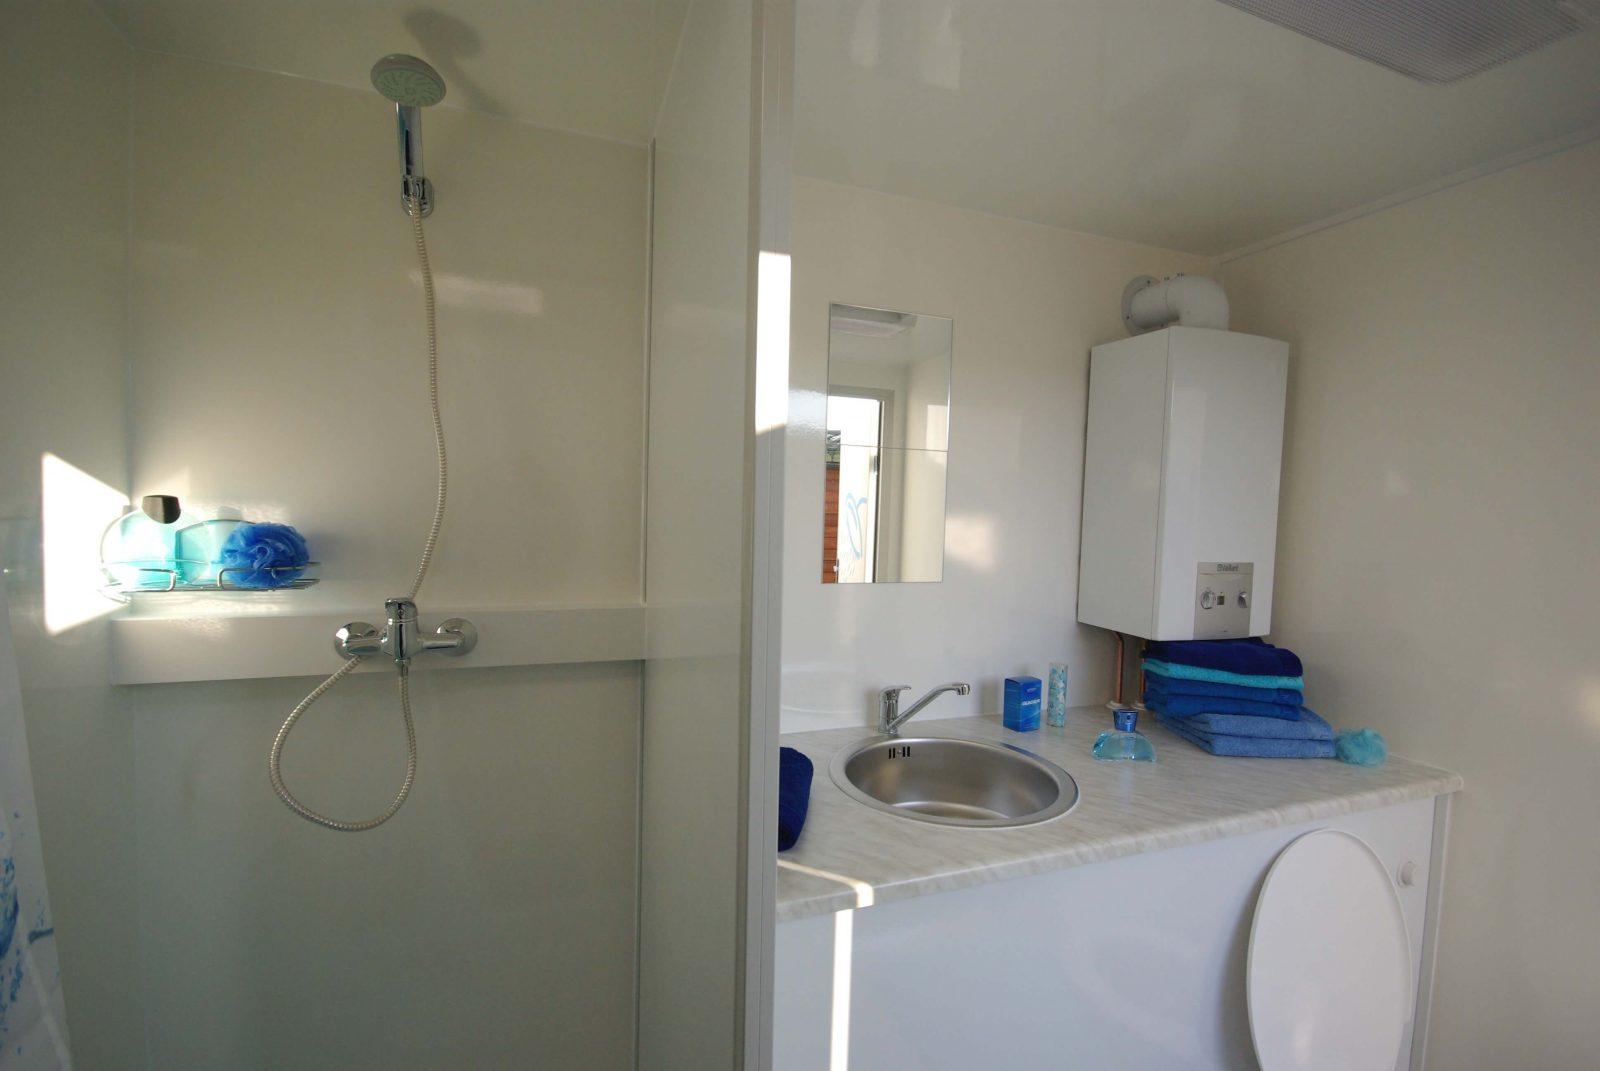 Camp Let Huren Privé Sanitair Binnenkant